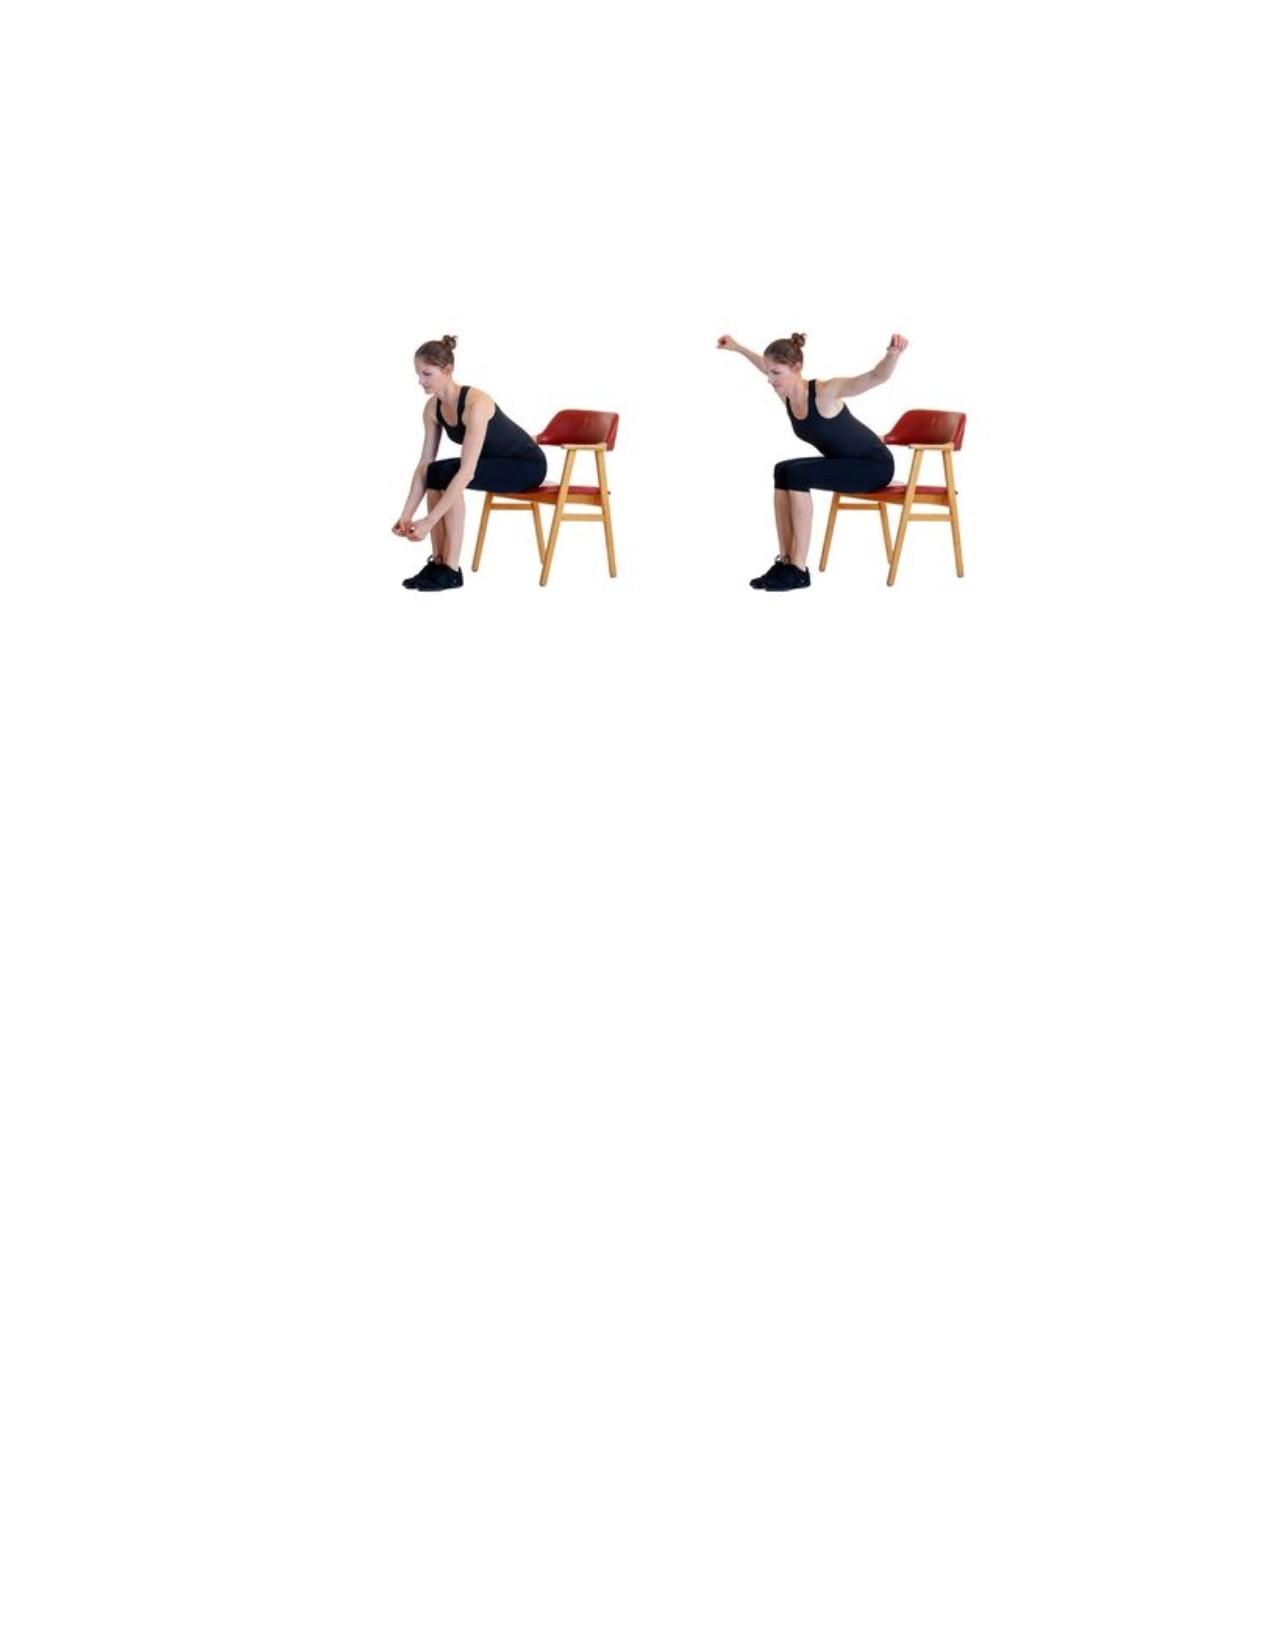 Homebody Workout: Chair Aerobics - July